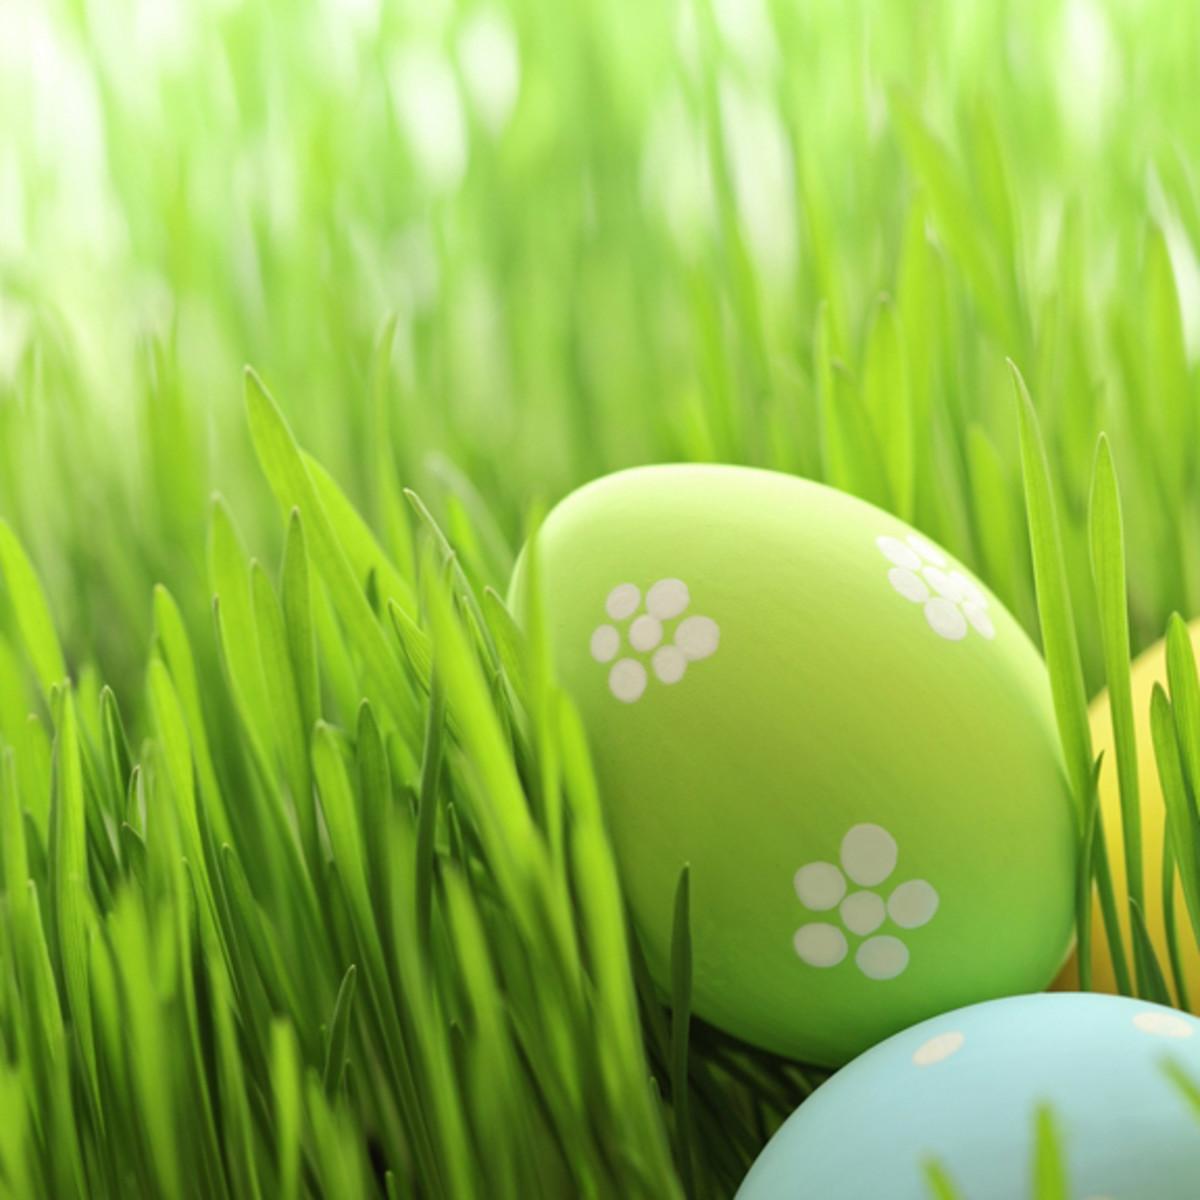 Wait a minute . . . bunnies don't lay eggs!